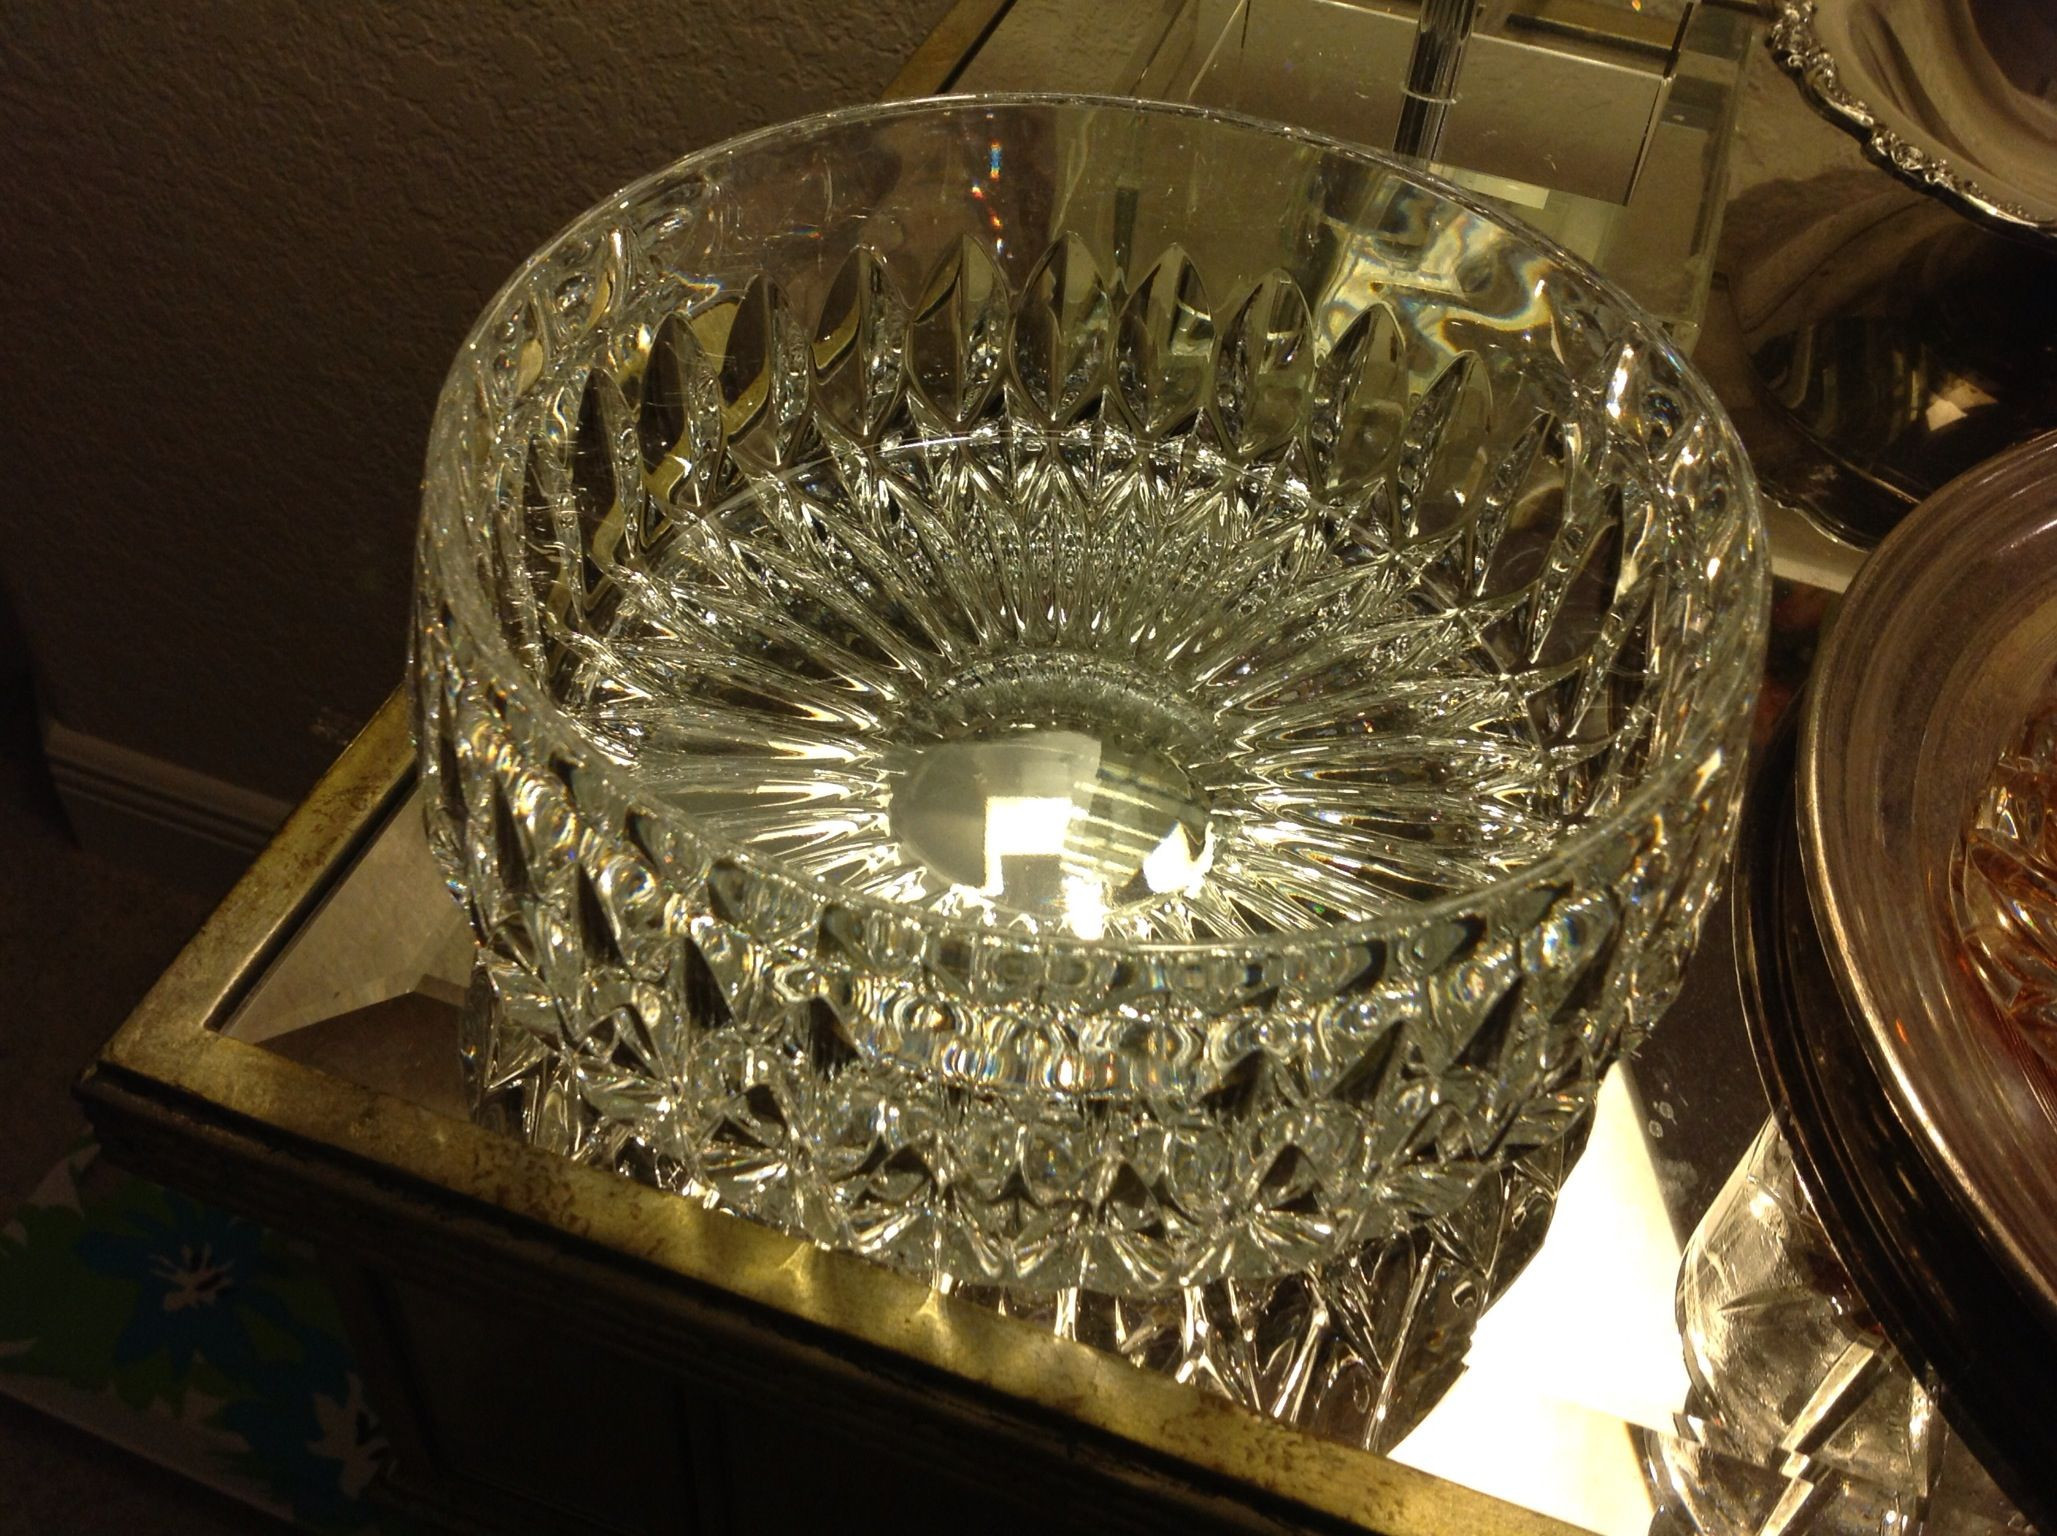 gorham crystal vase of large gorham crystal bowl 9 great finds goodwill haul pinterest in large gorham crystal bowl 9